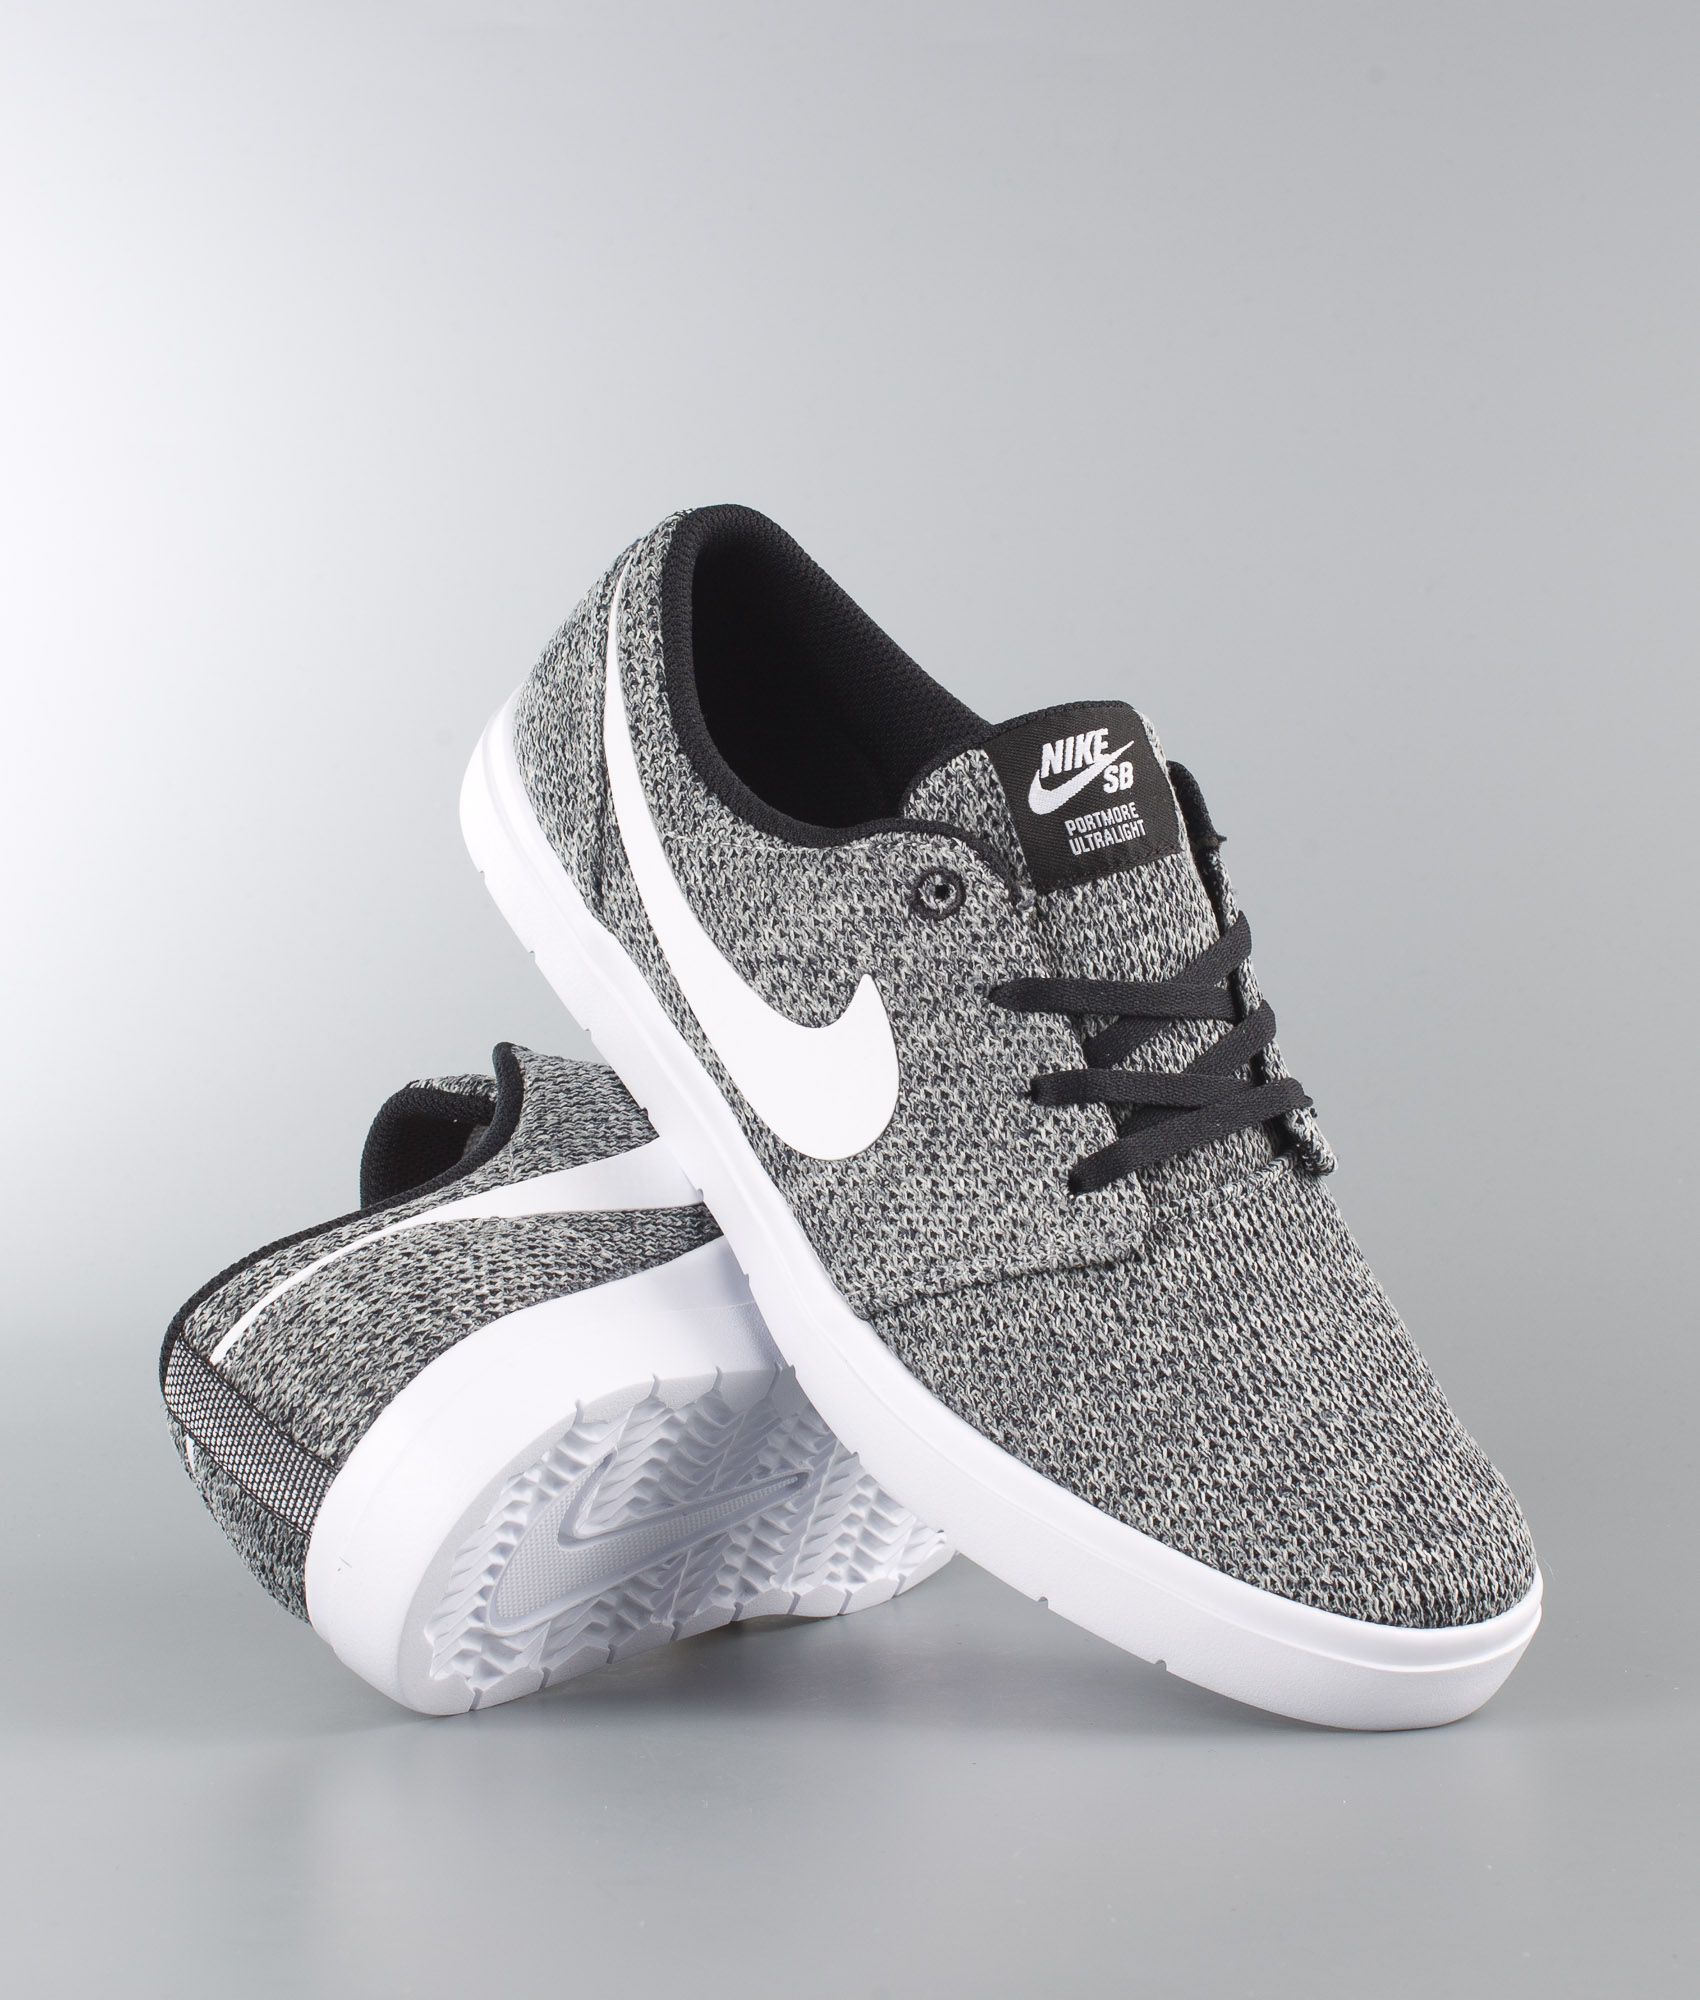 Nike Portmore II Ultralight Shoes